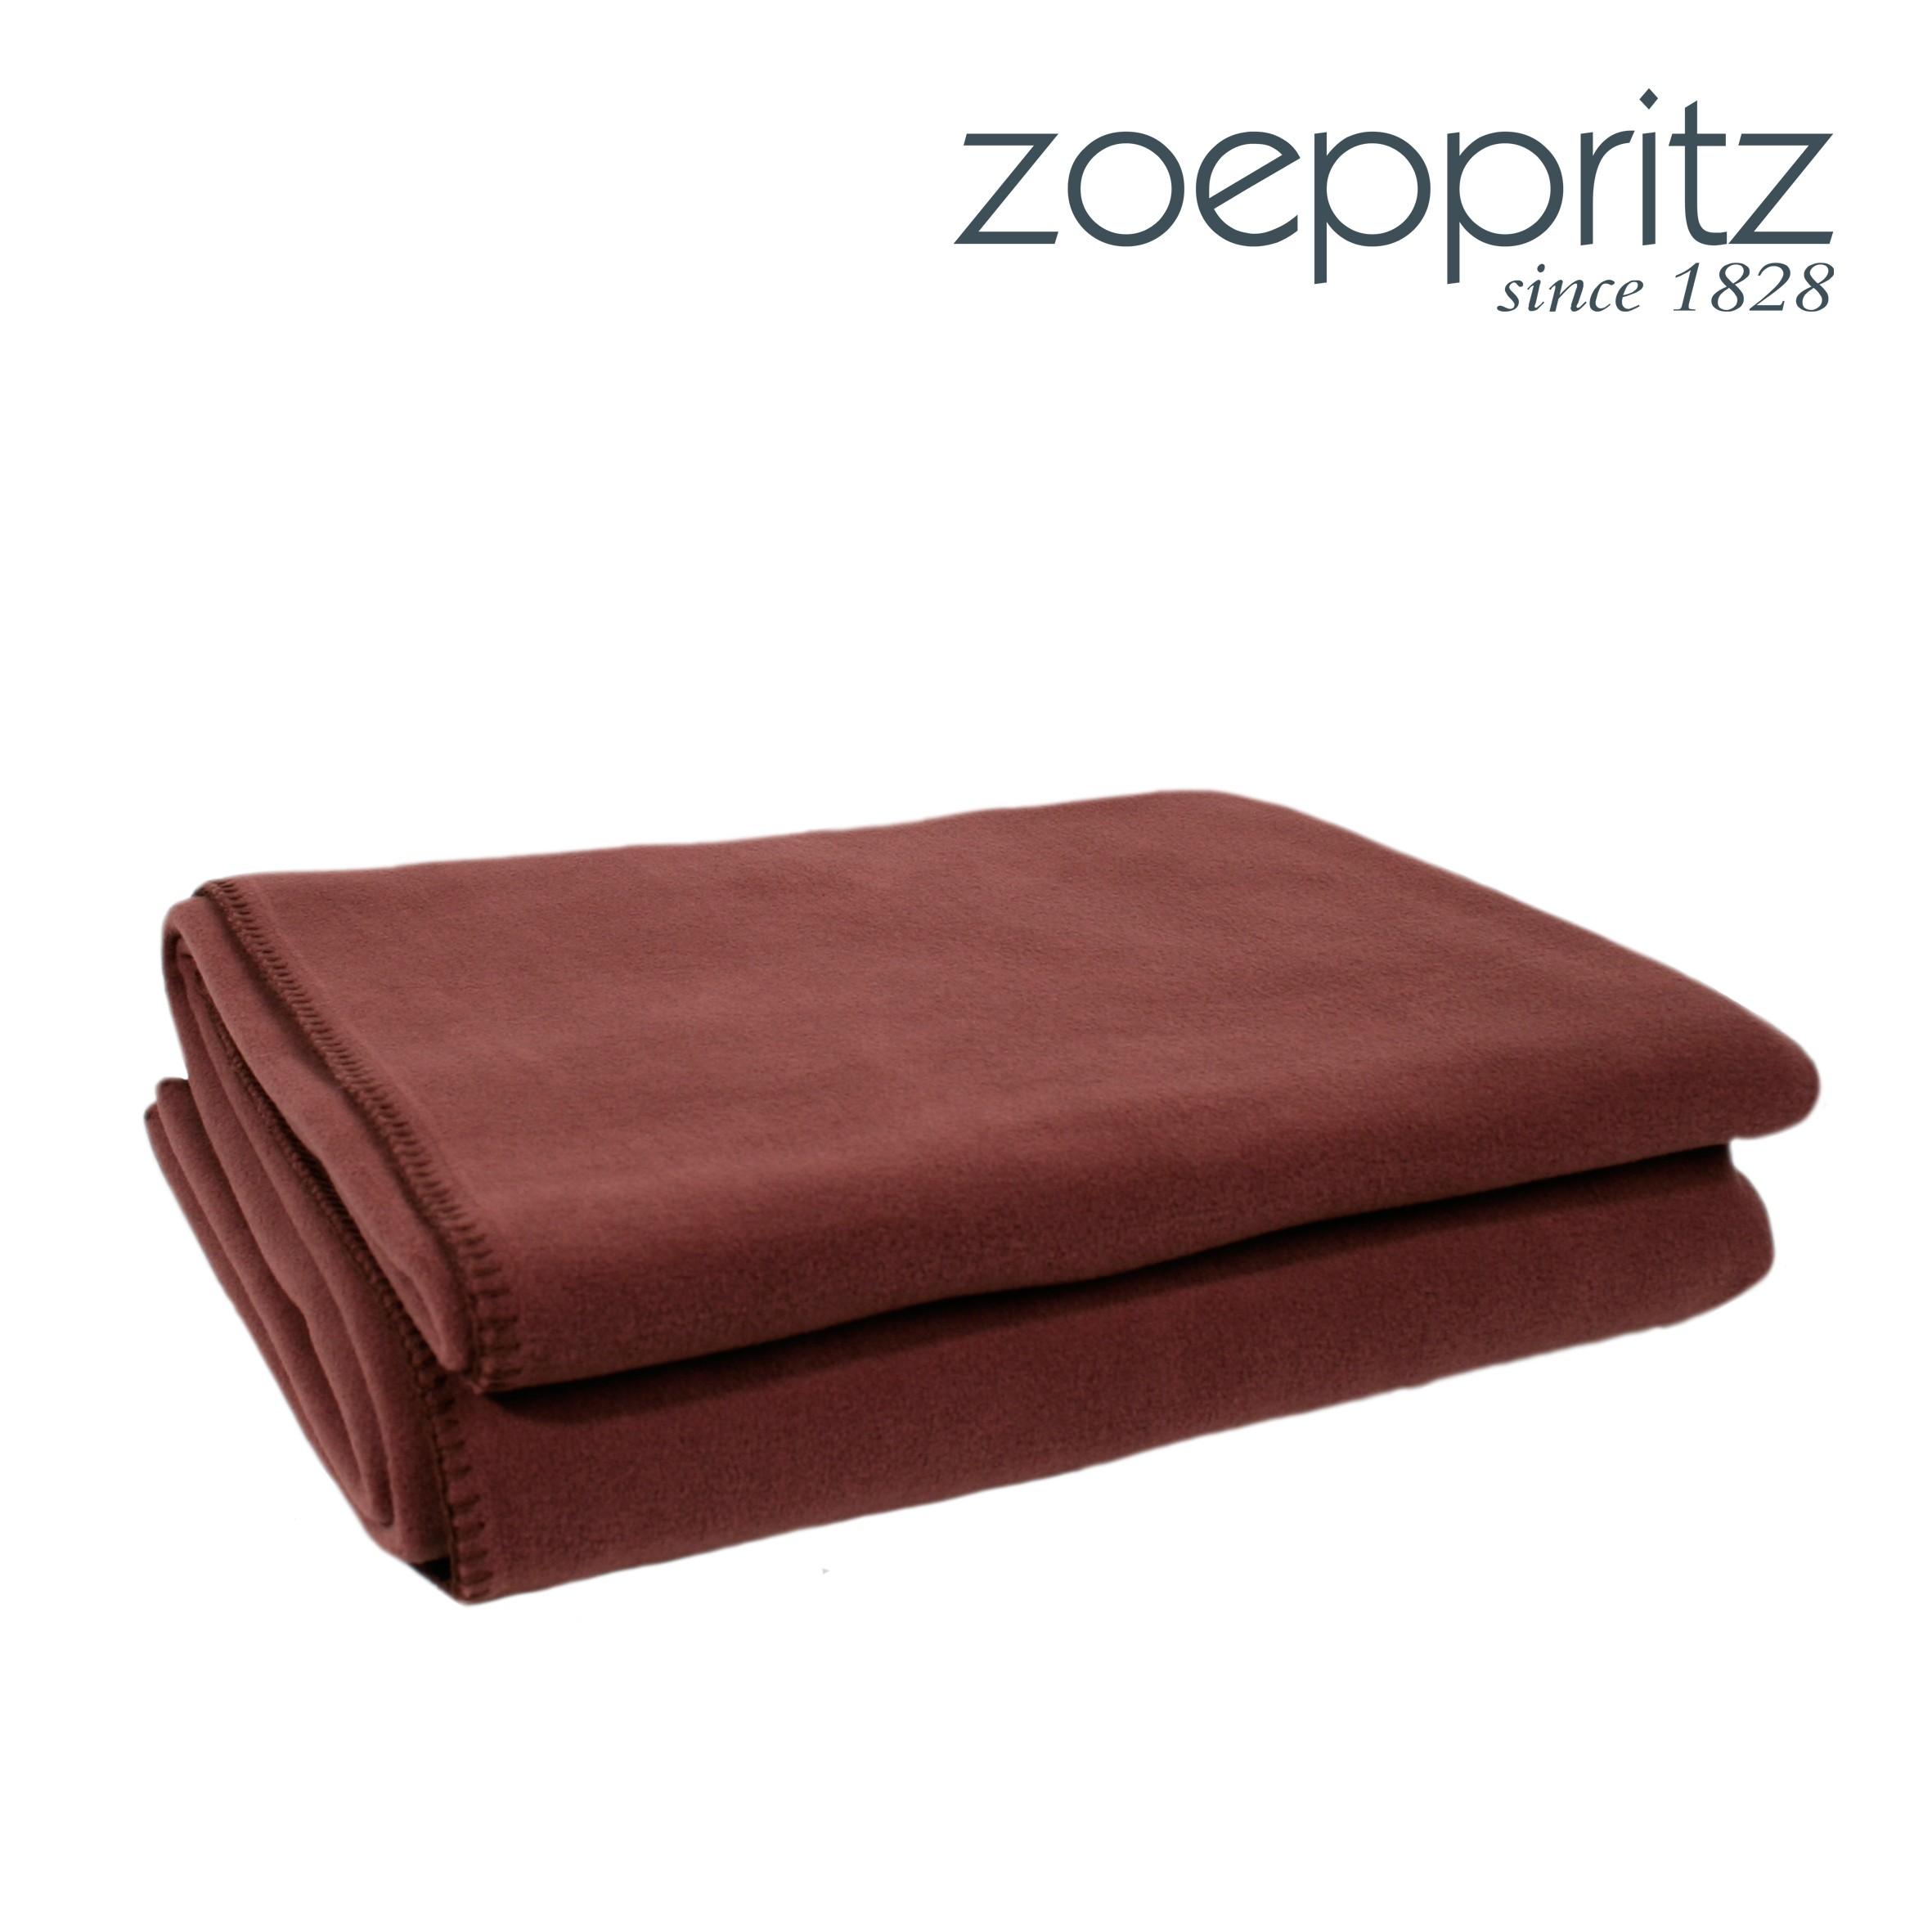 zoeppritz plaid soft fleece chocolate. Black Bedroom Furniture Sets. Home Design Ideas